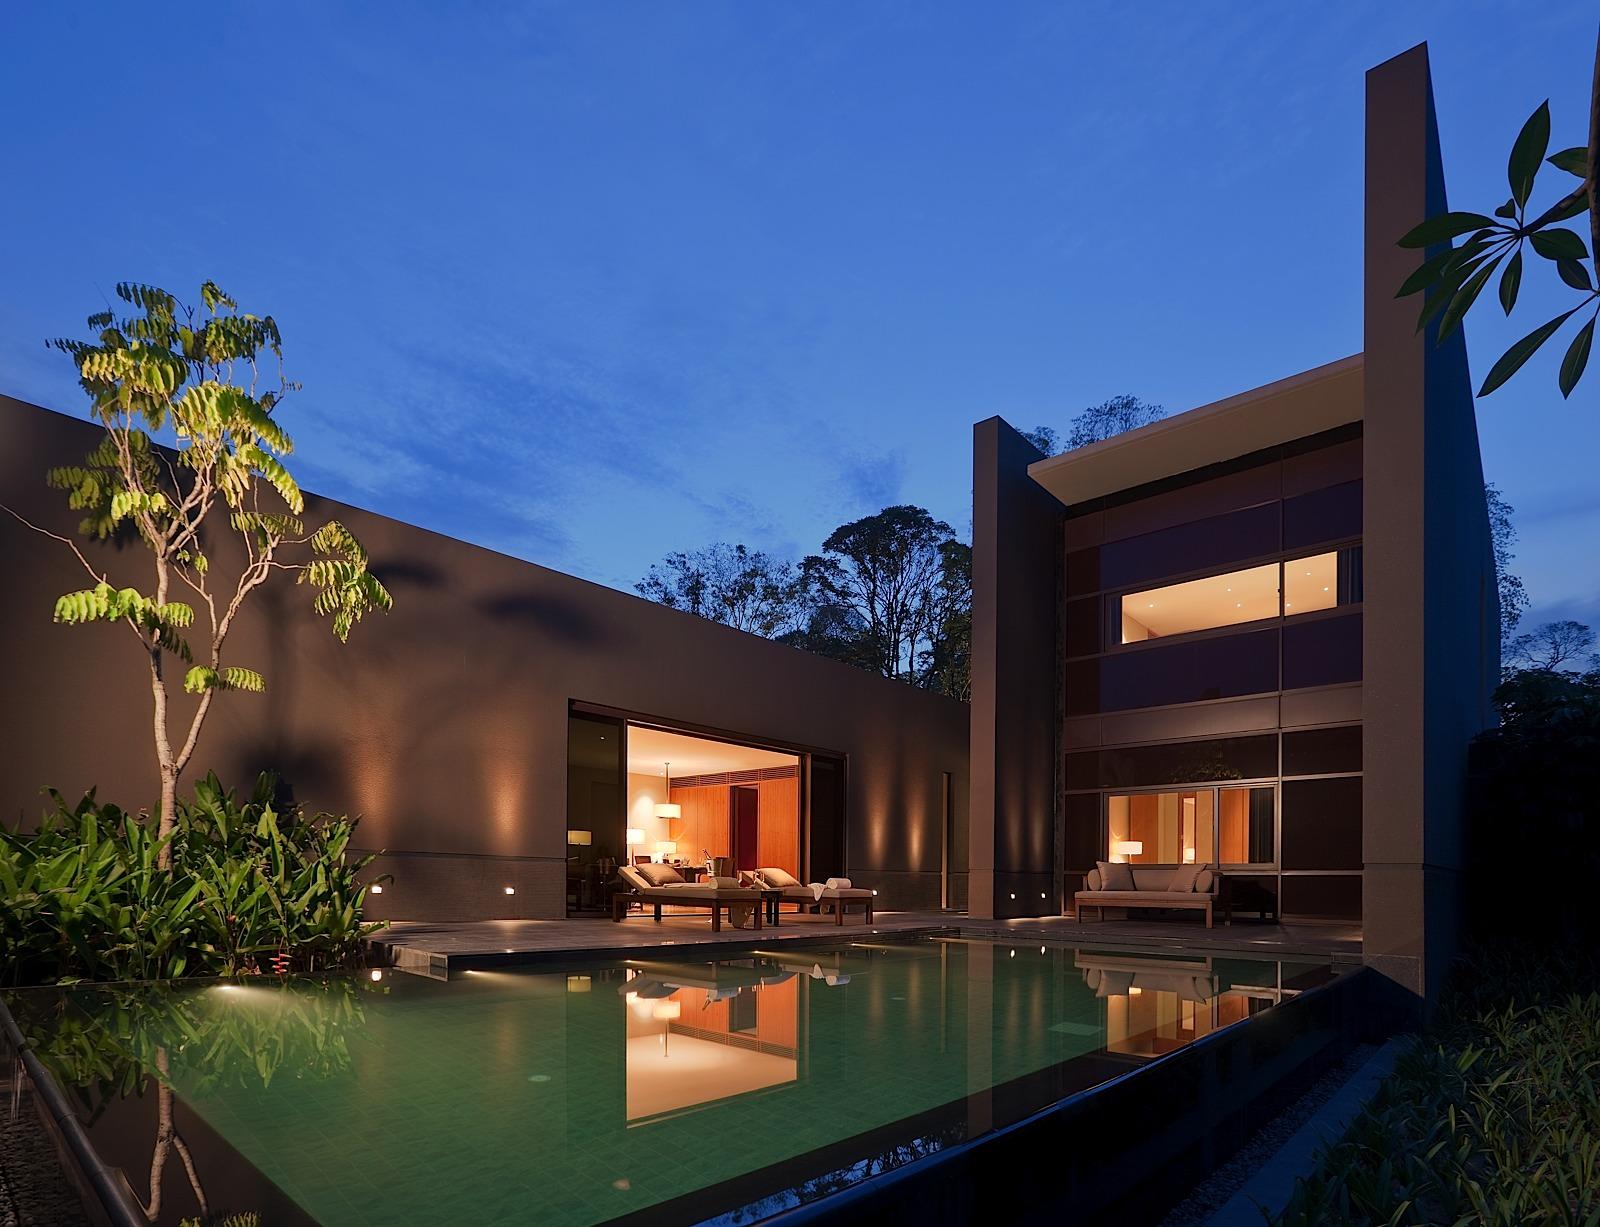 3d Stone Wallpaper Malaysia Singapore Vacation Rentals Luxury Bungalow Sentosa Island